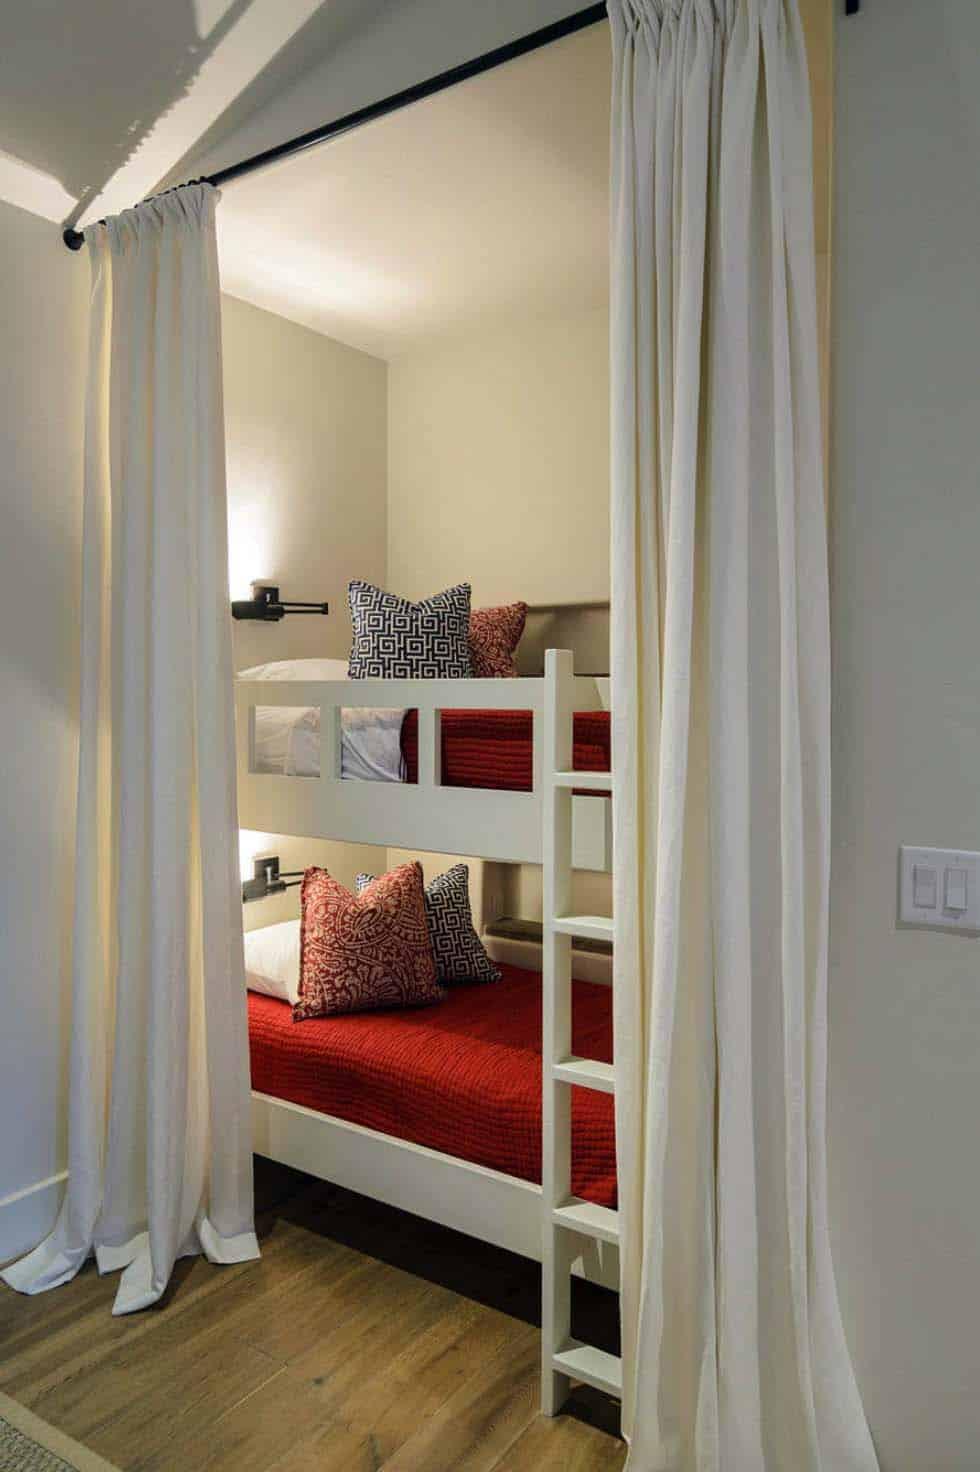 Rustic Mediterranean Style Home Design-23-1 Kindesign